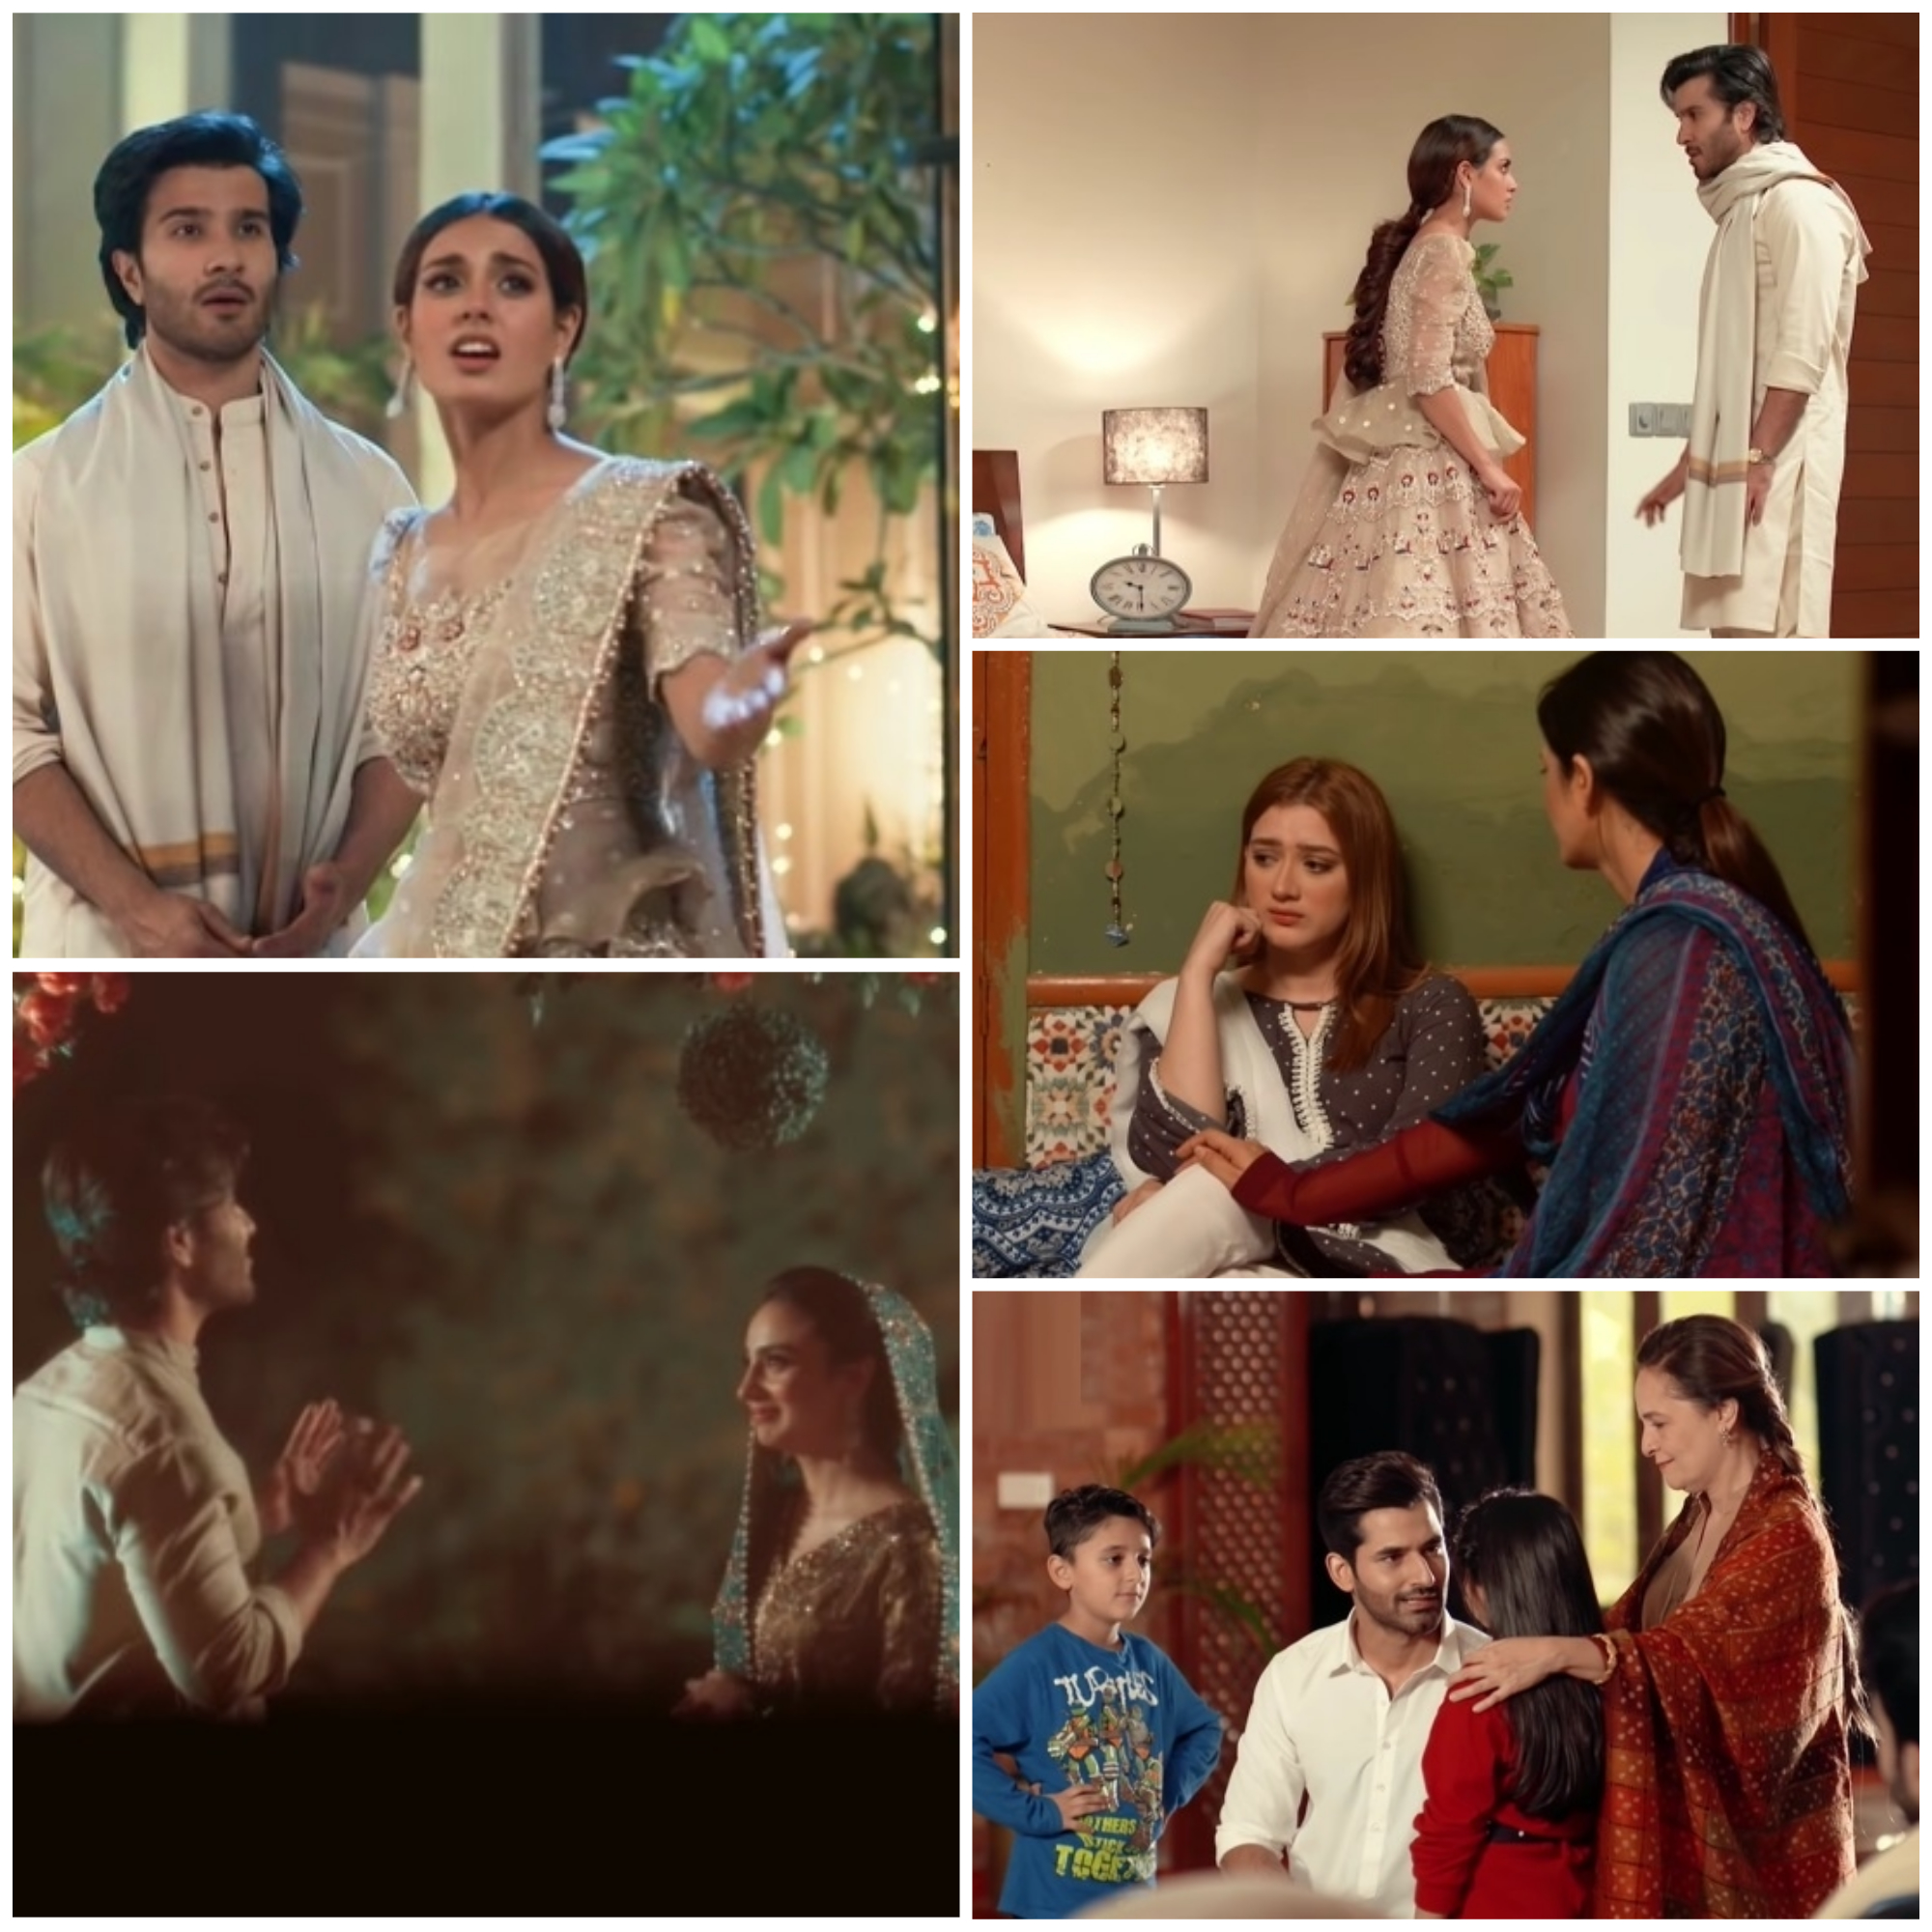 Khuda Aur Mohabbat 3 Episode 4 Story Review - Farhad's Perplexity